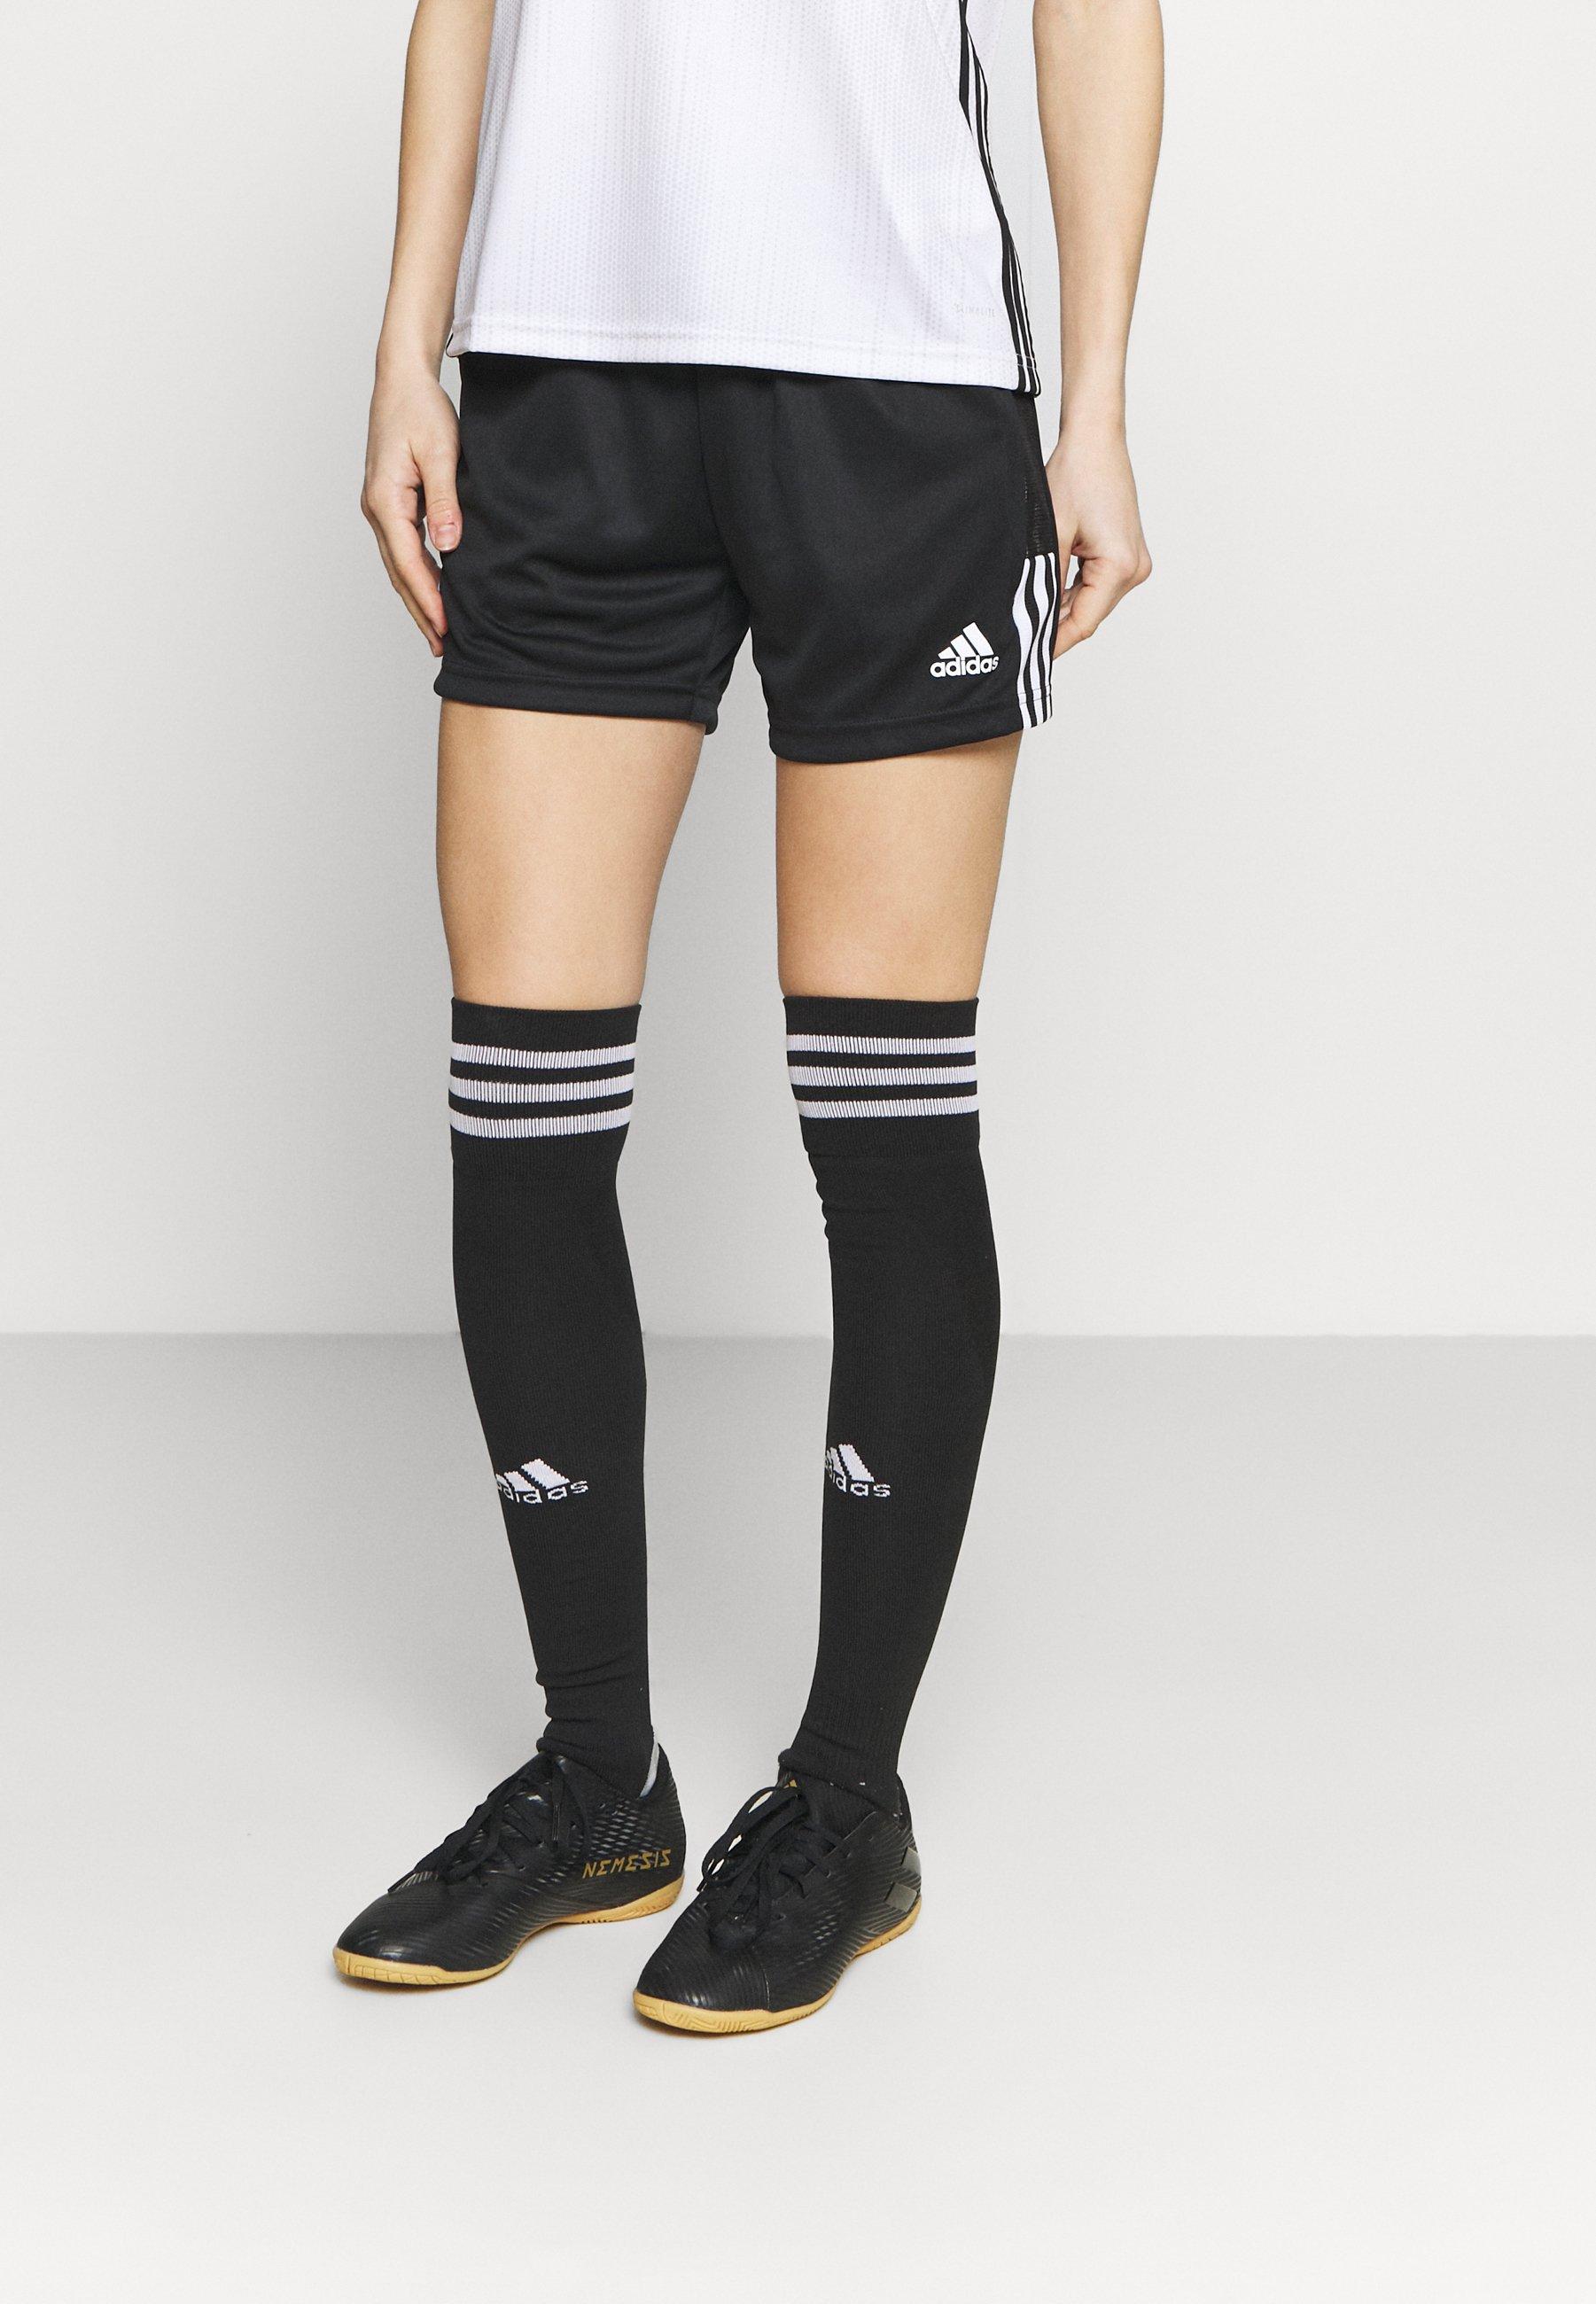 Damen TIRO - kurze Sporthose